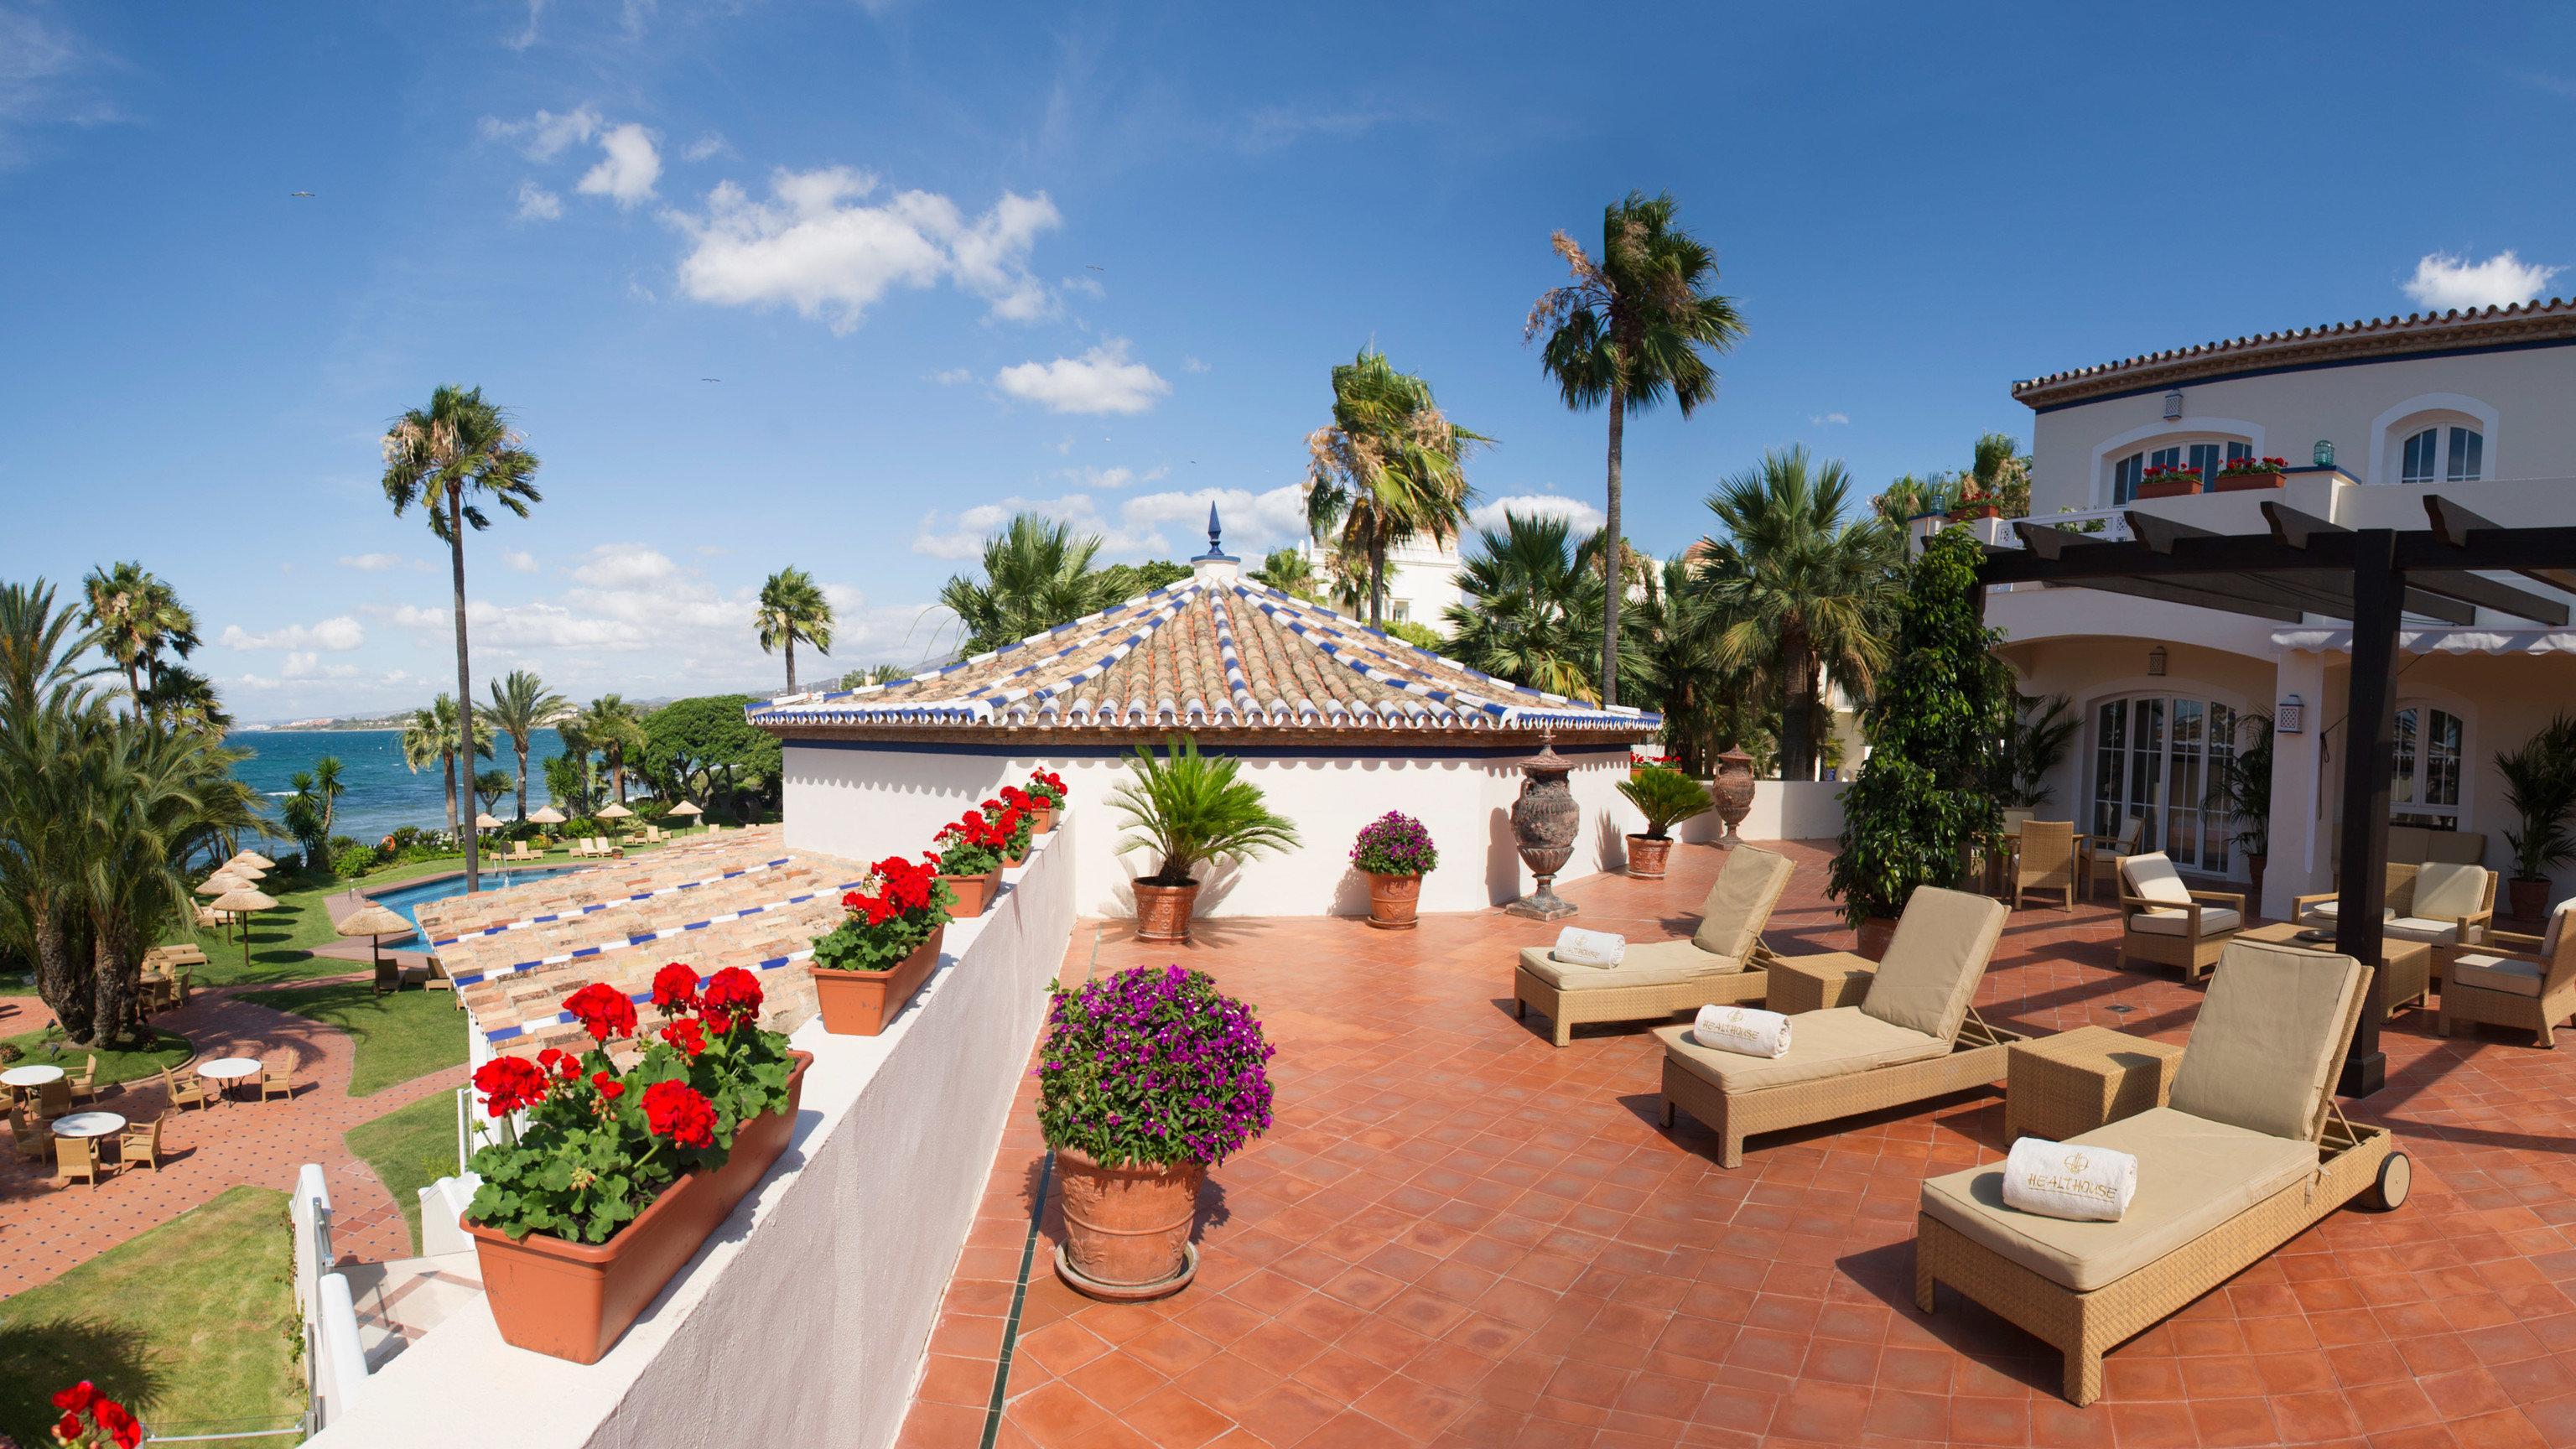 sky leisure Resort palace hacienda Garden Villa plaza plant palm